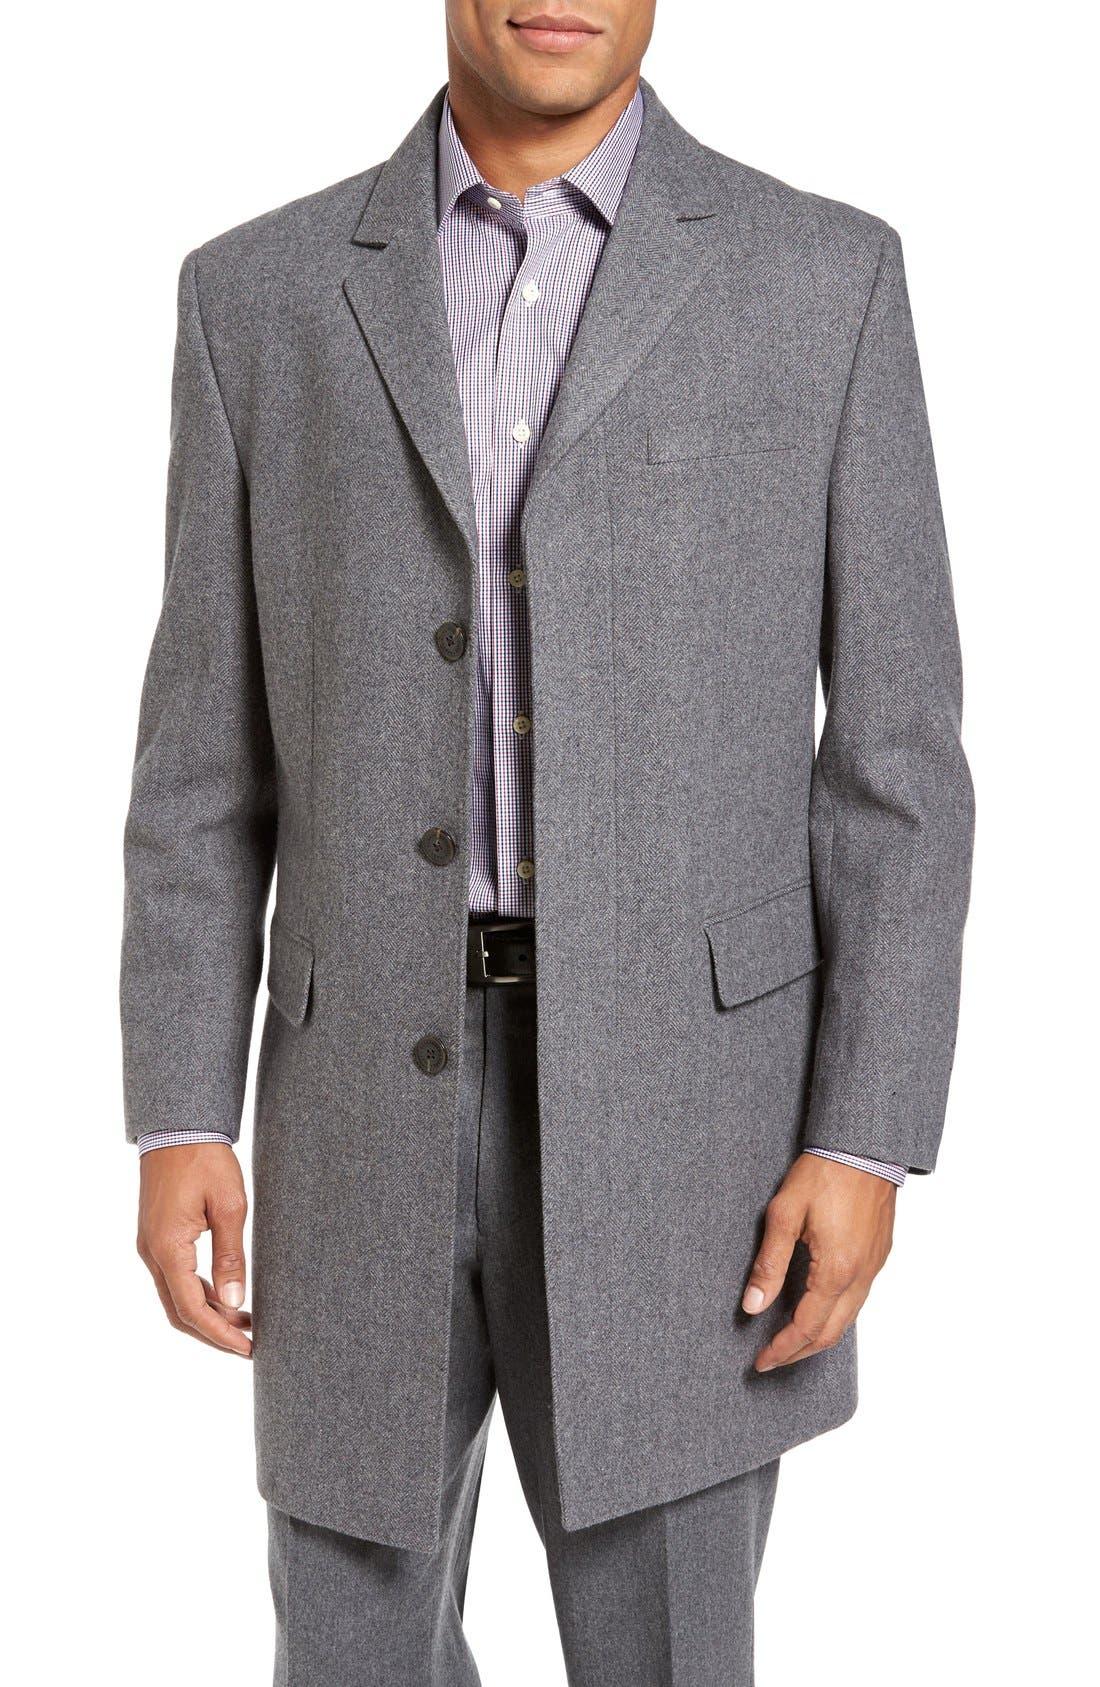 Hart Schaffner Marx 'Maitland' Classic Fit Wool Blend Overcoat